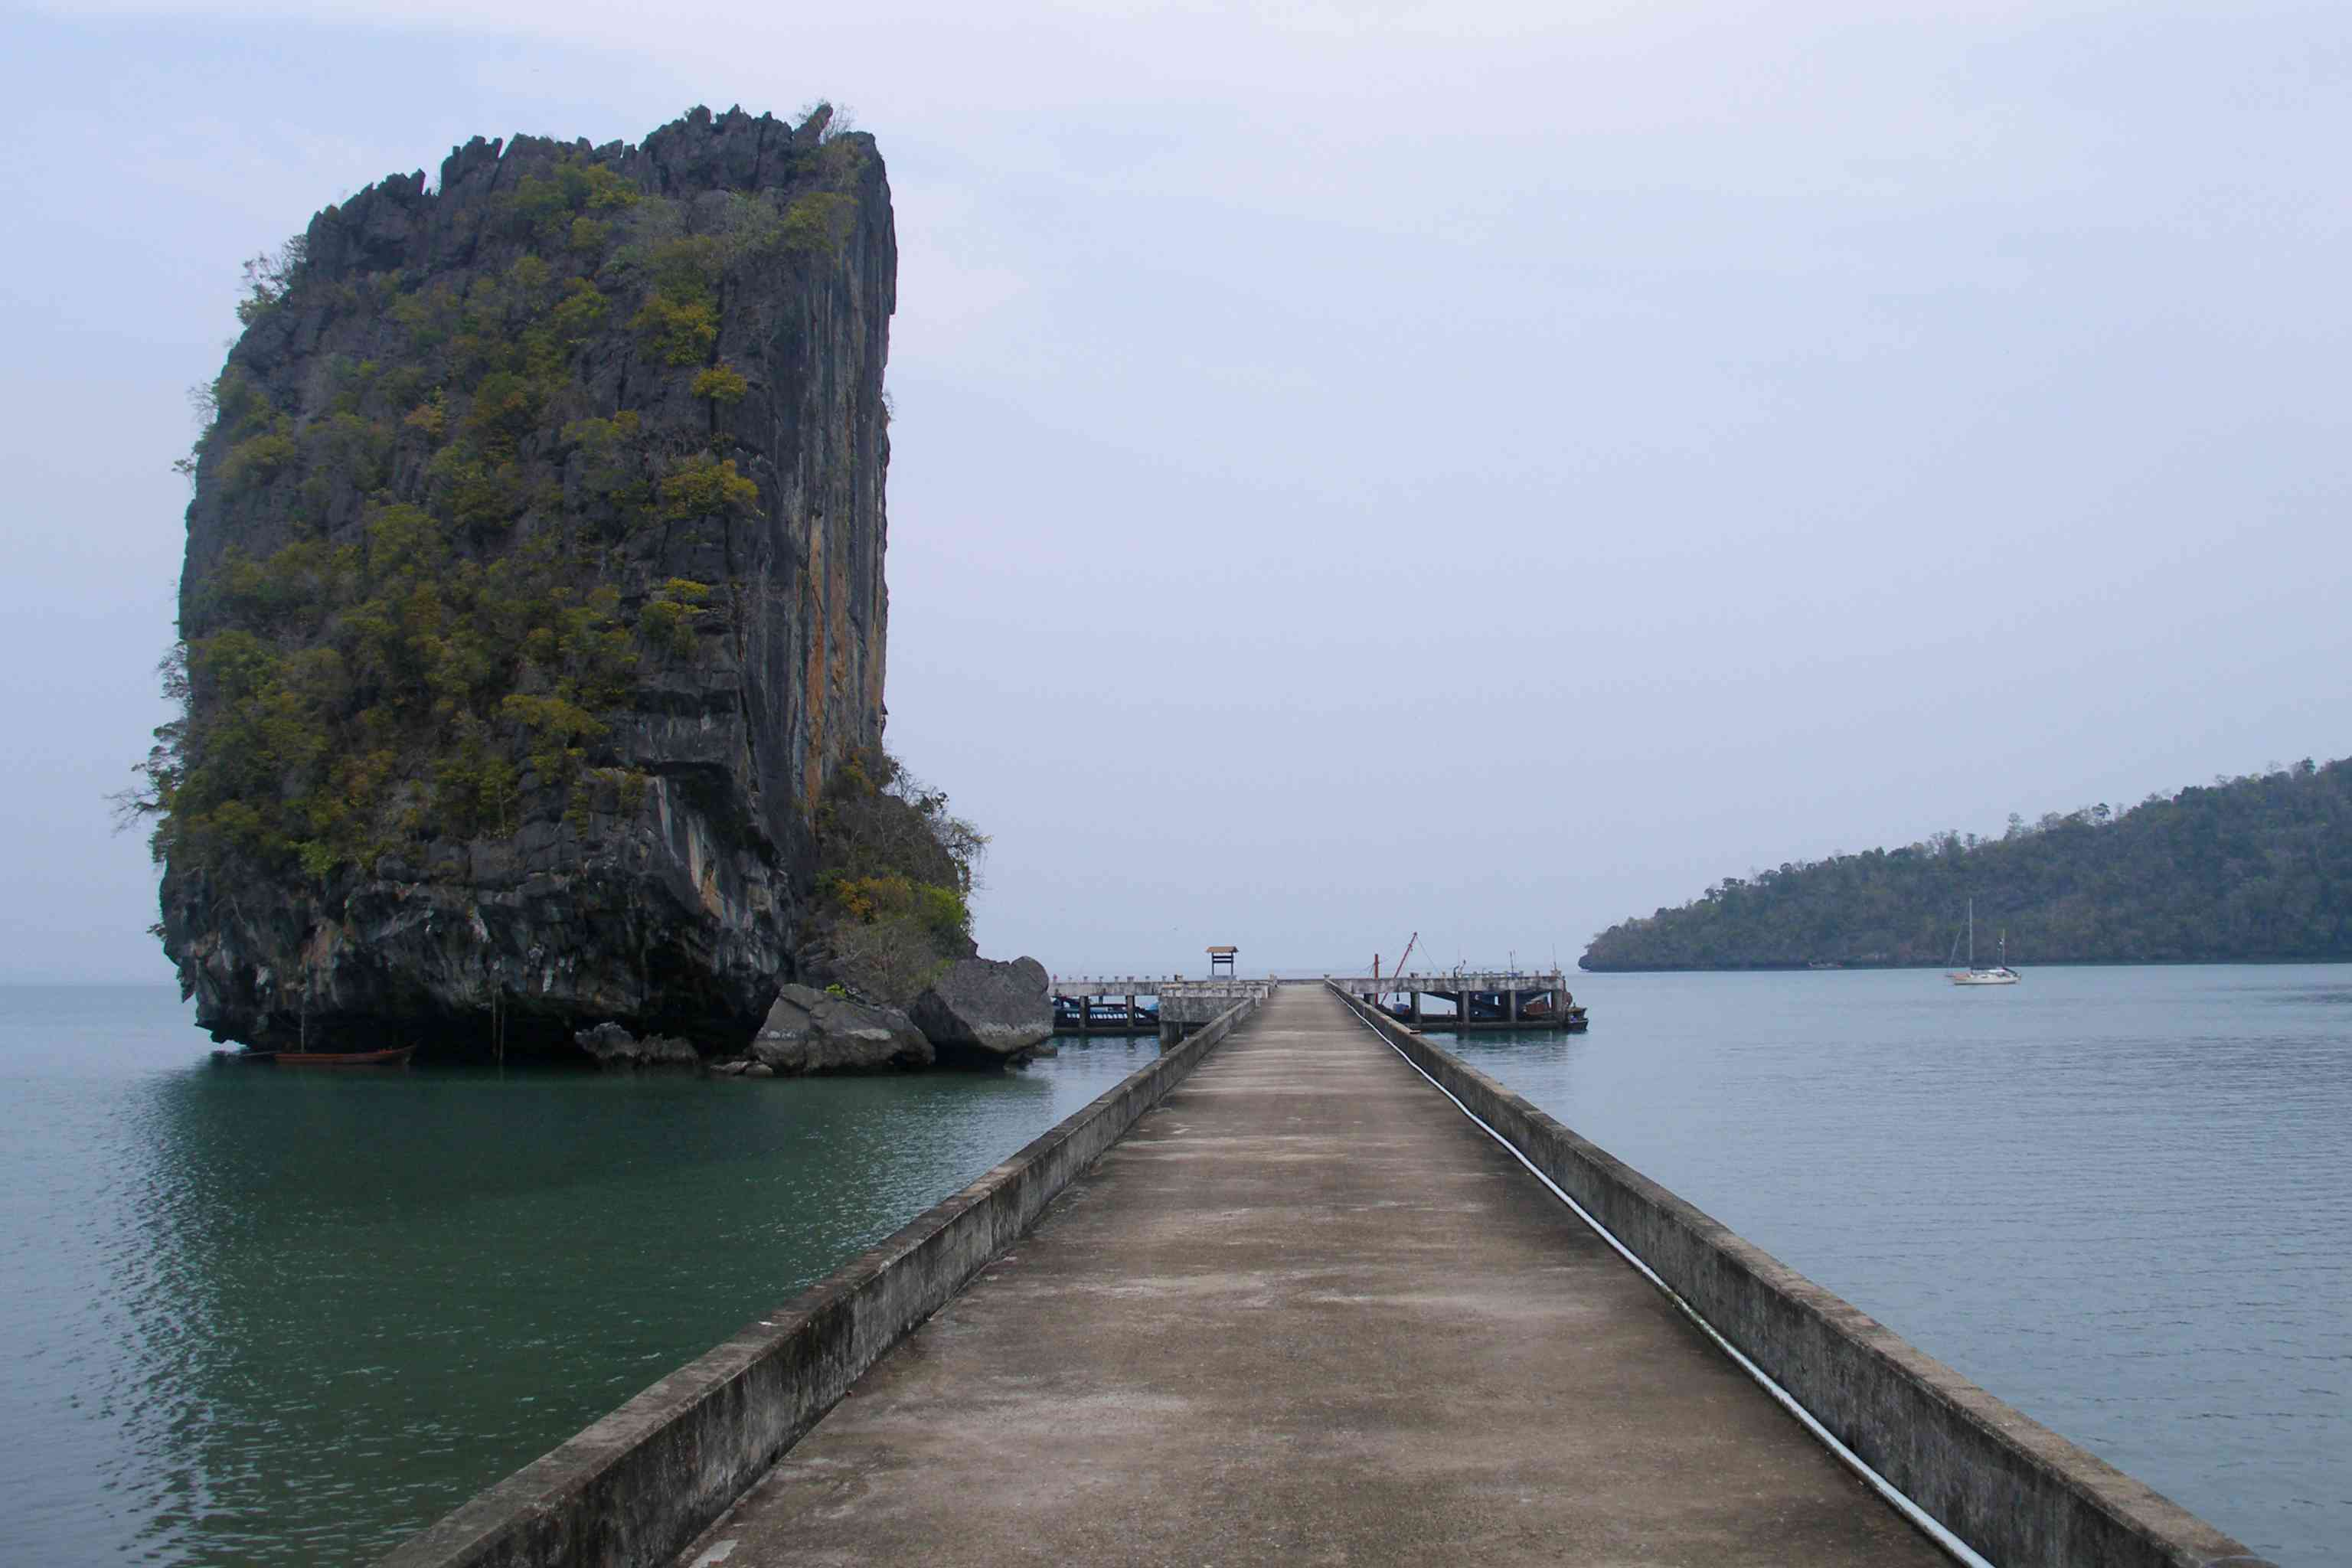 Tarutao Island, ancient limestone rock formations